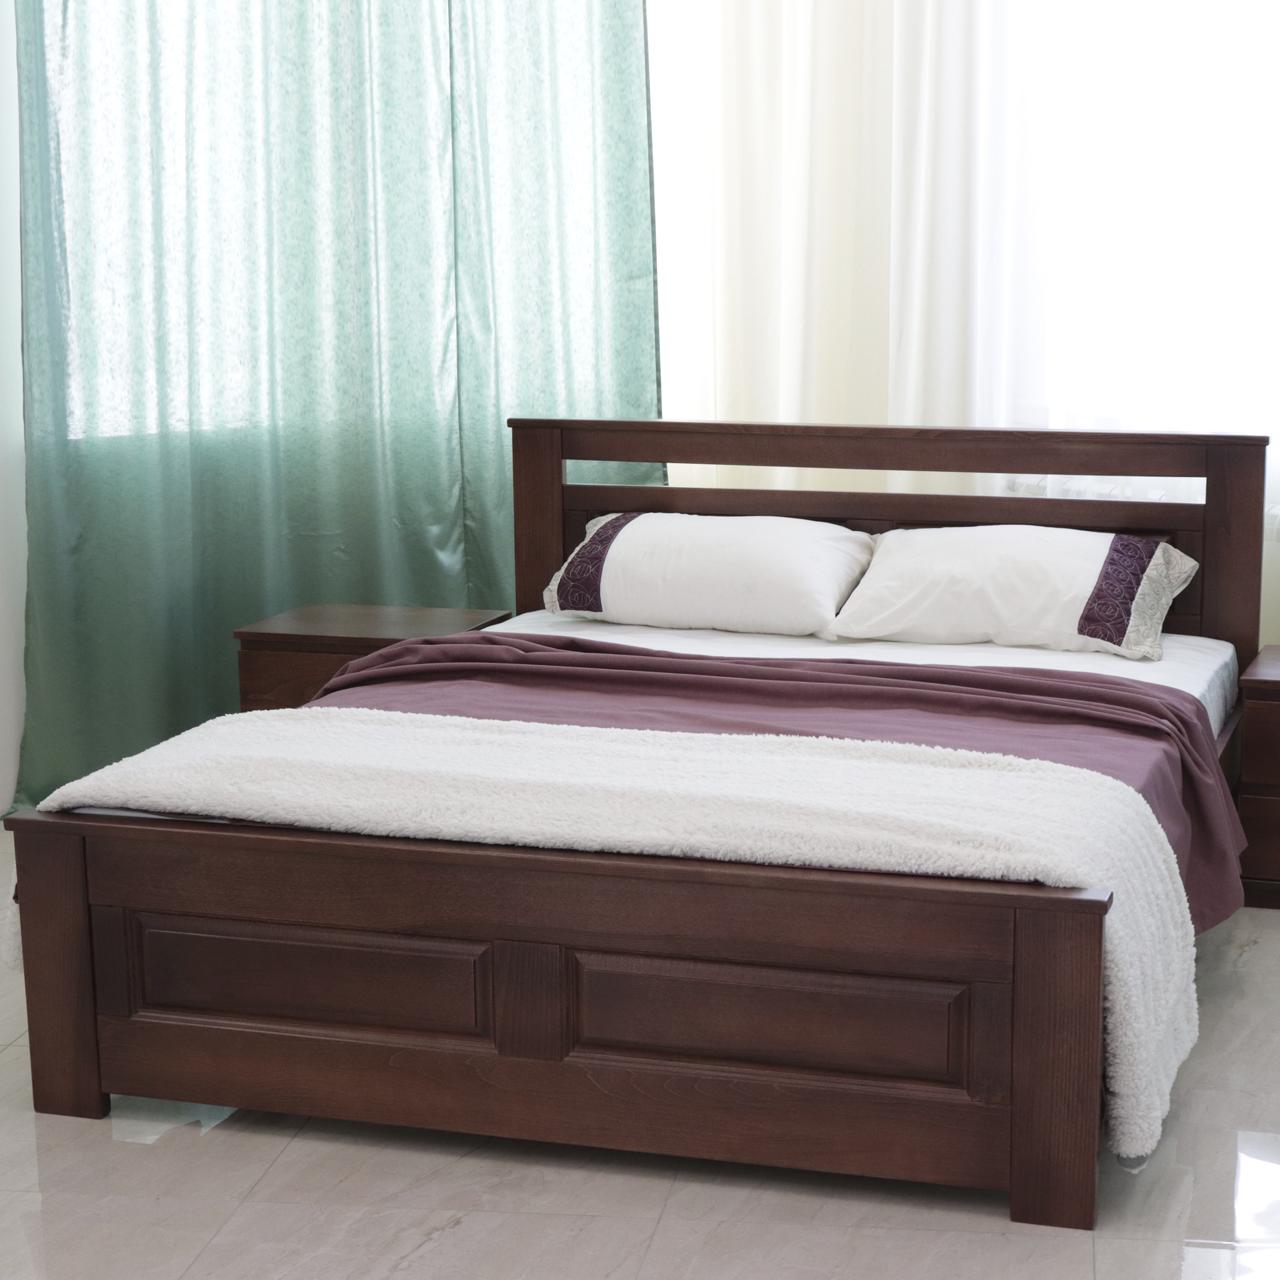 Ліжко дерев'яне полуторне Клеопатра (масив бука)